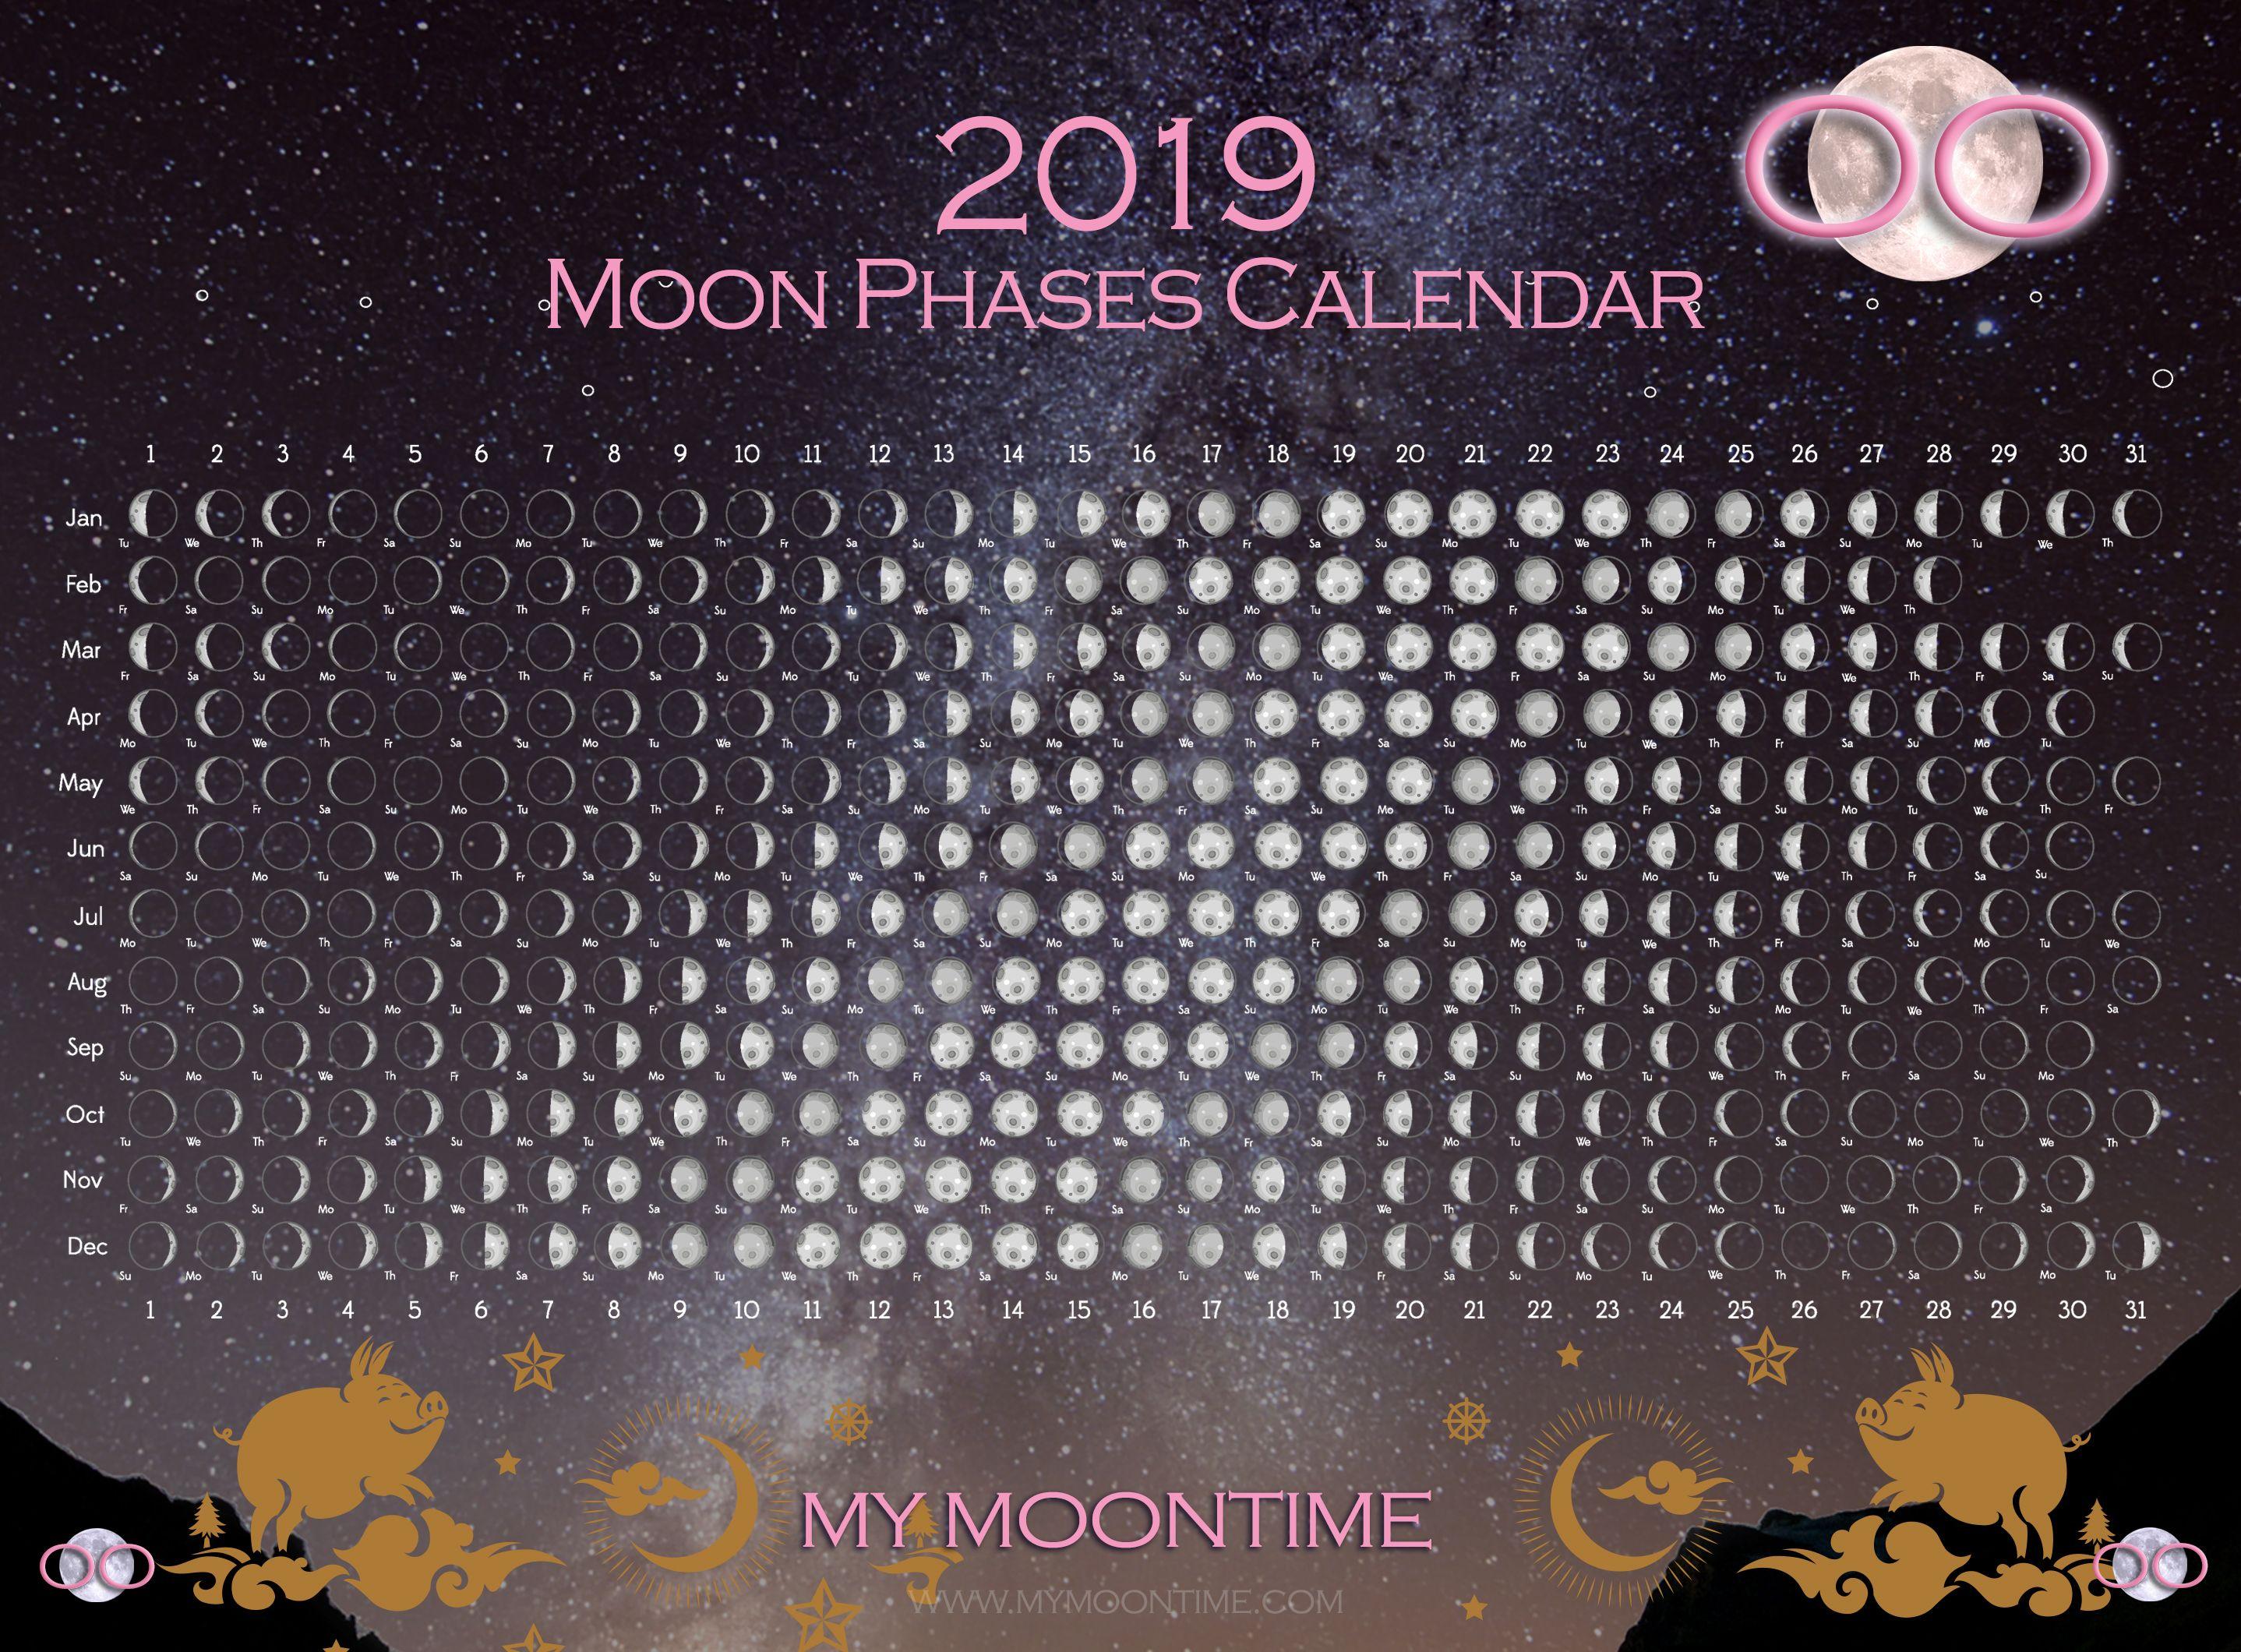 2019 moon phase calendar from my moontime app calendario